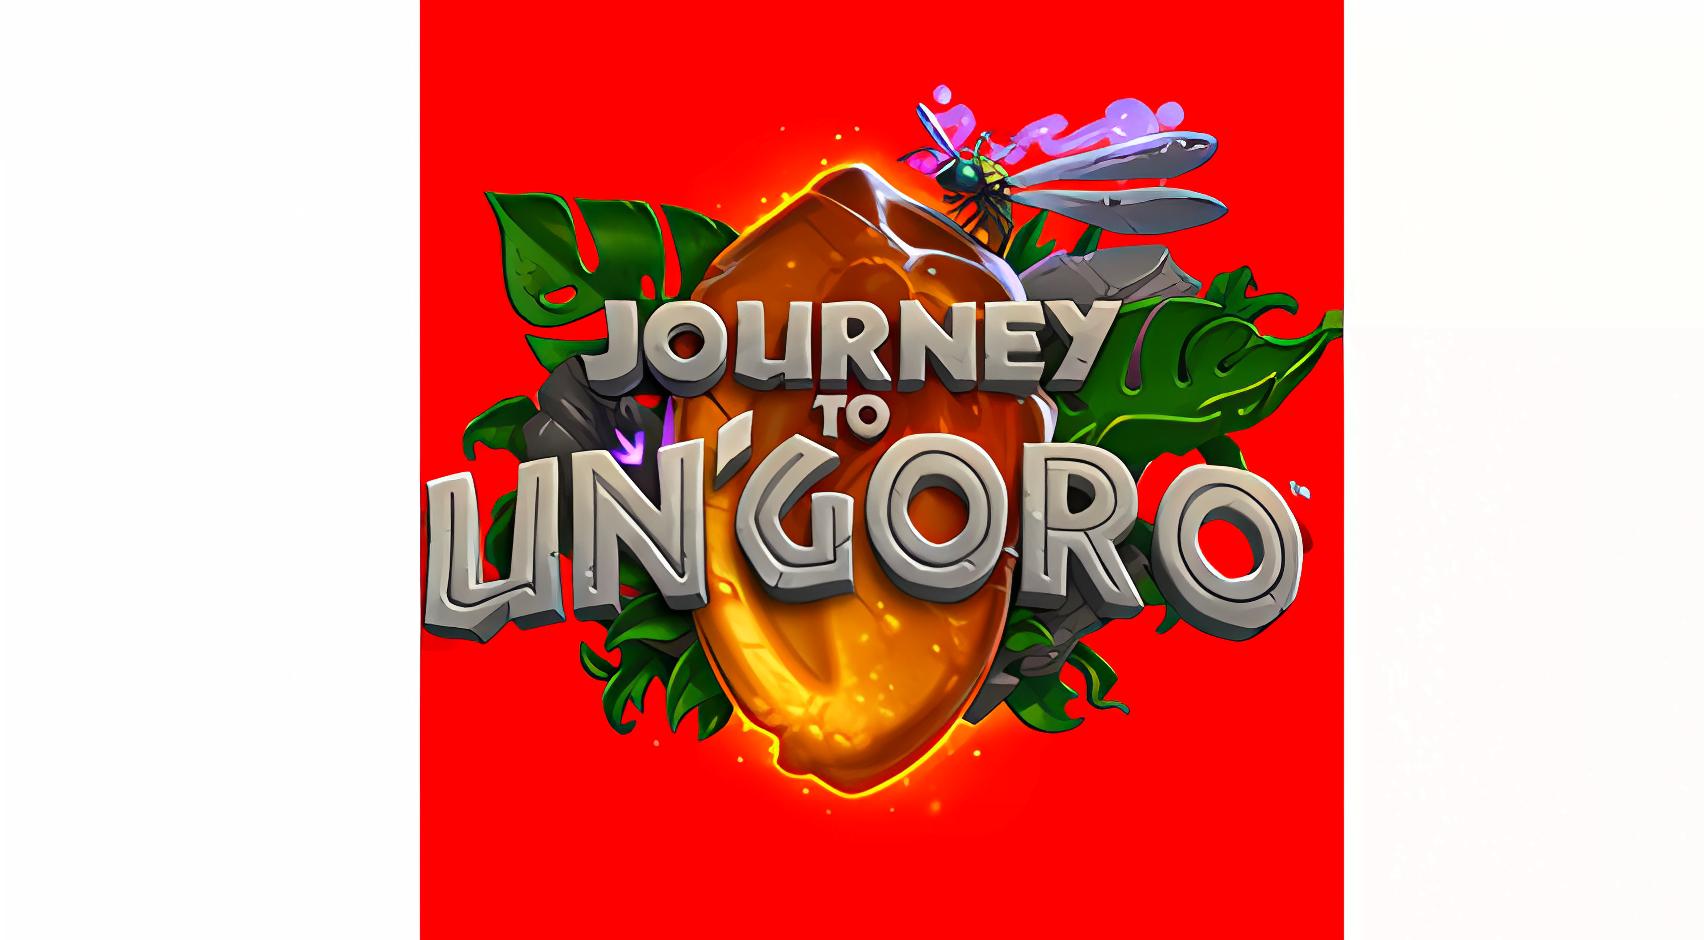 Journey to Un'Goro - Hearthstone card packs